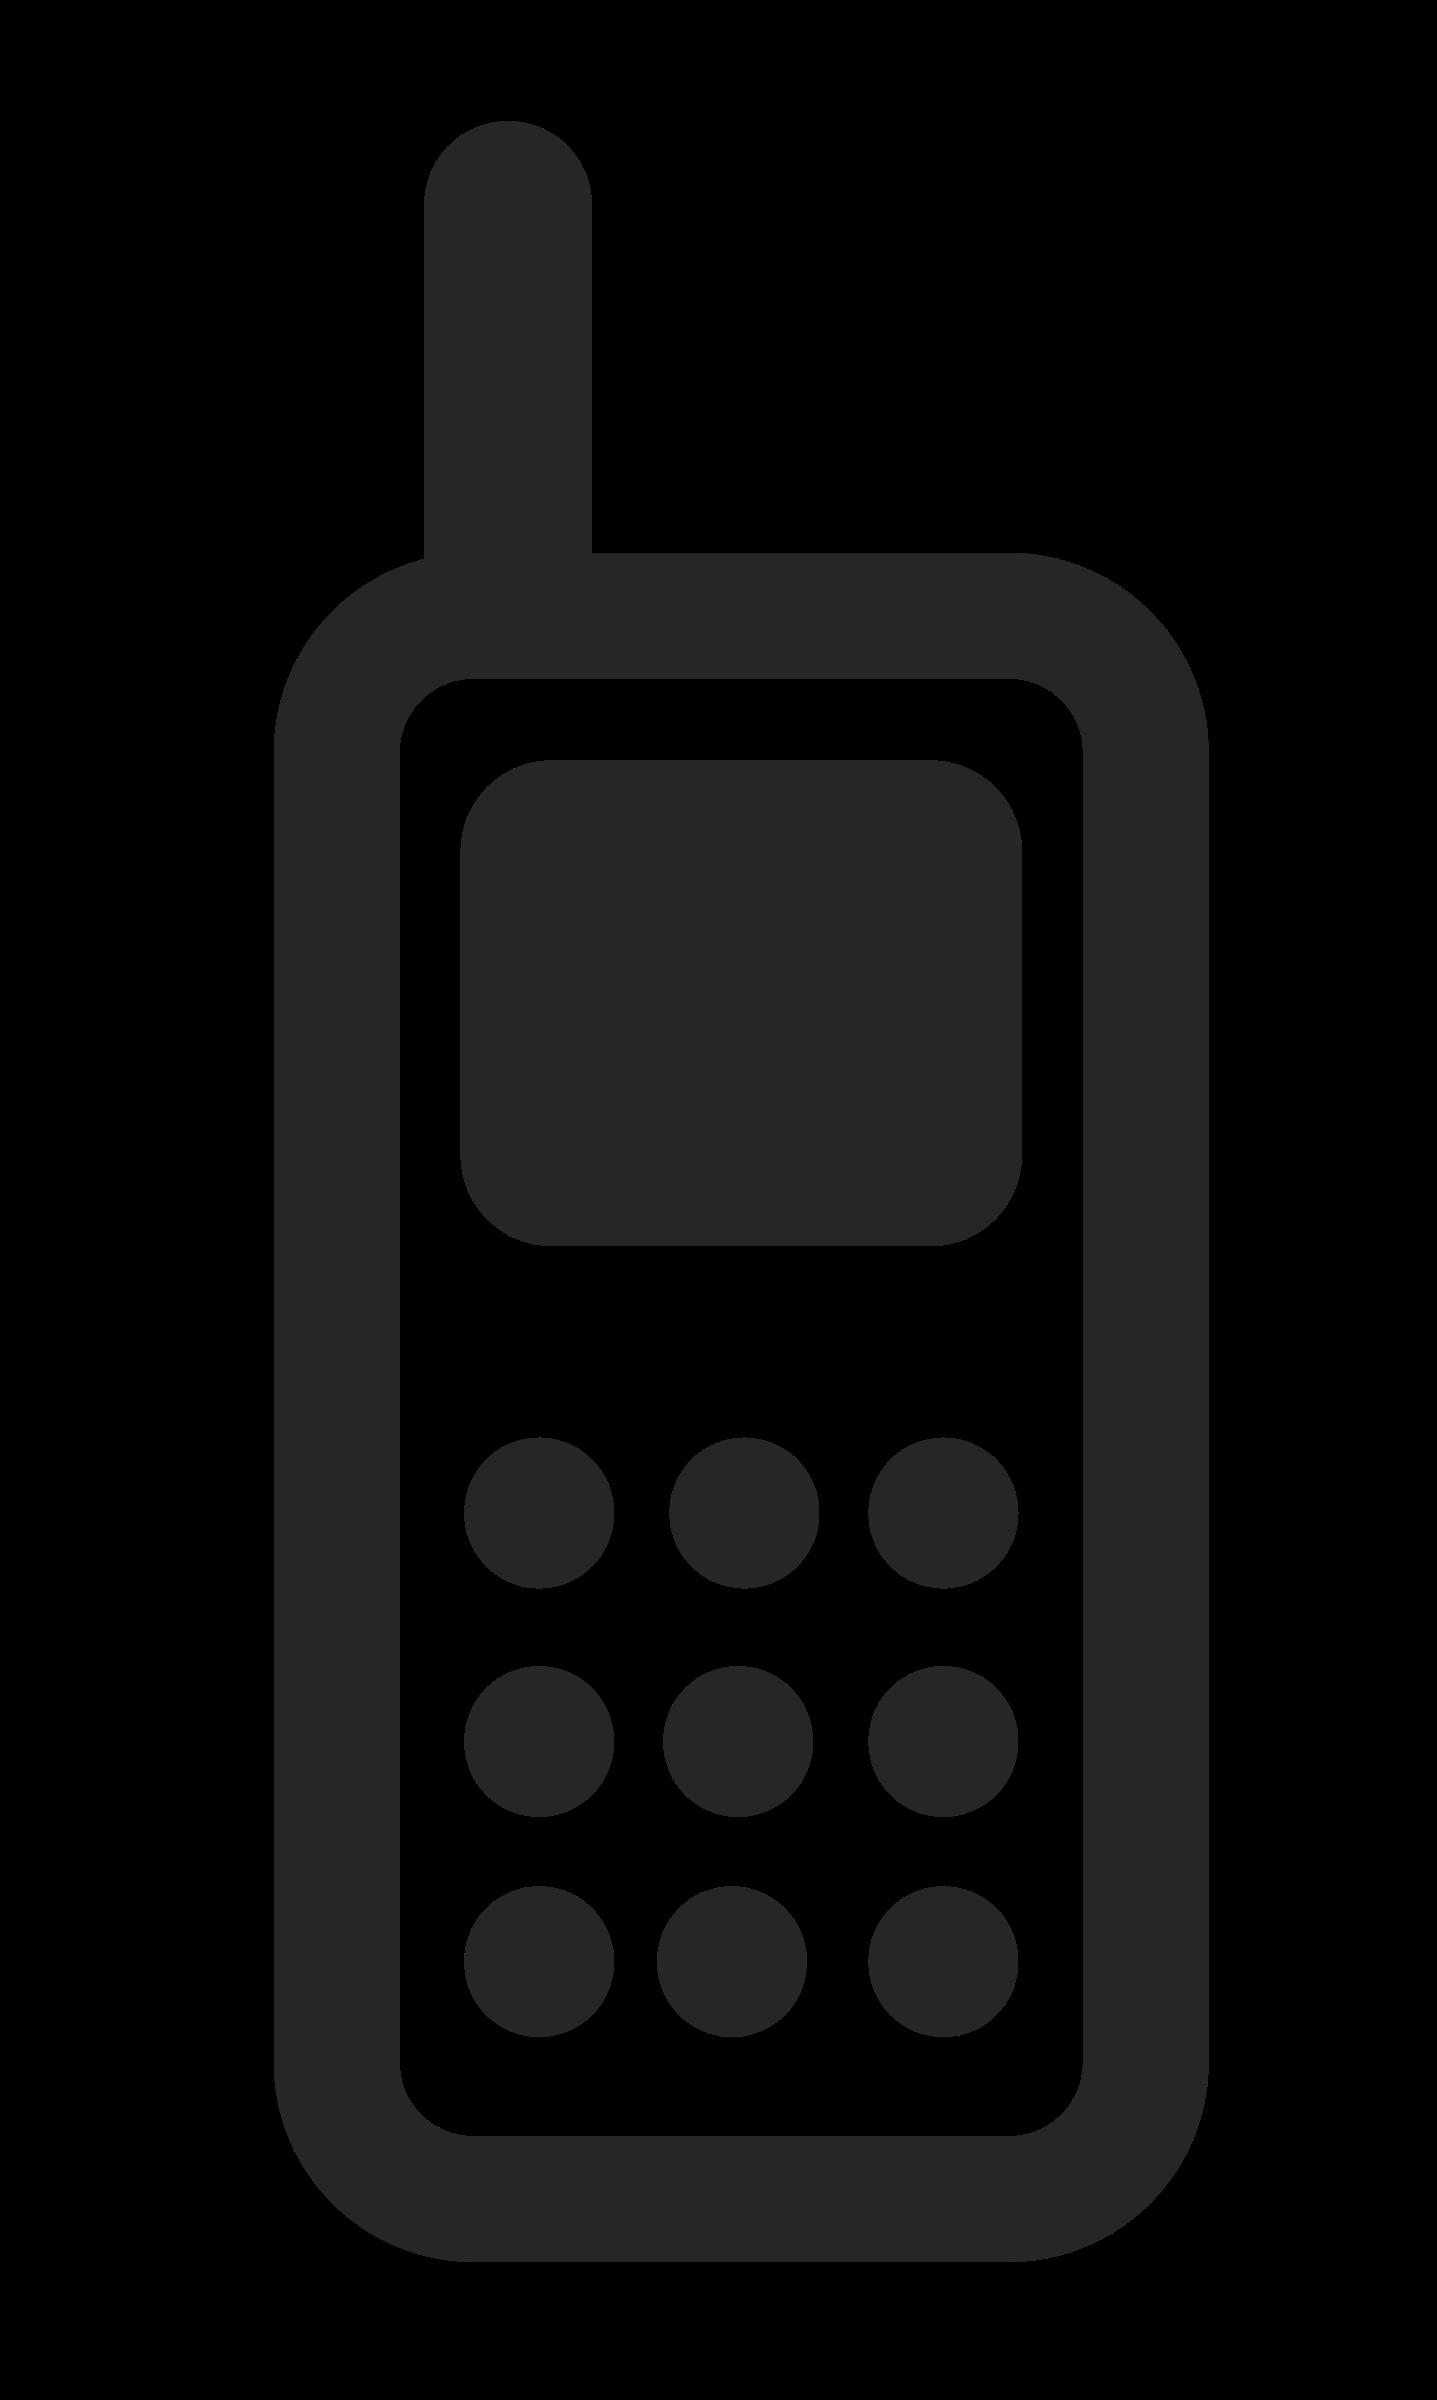 Clipart phone digital. Mobile png clip art